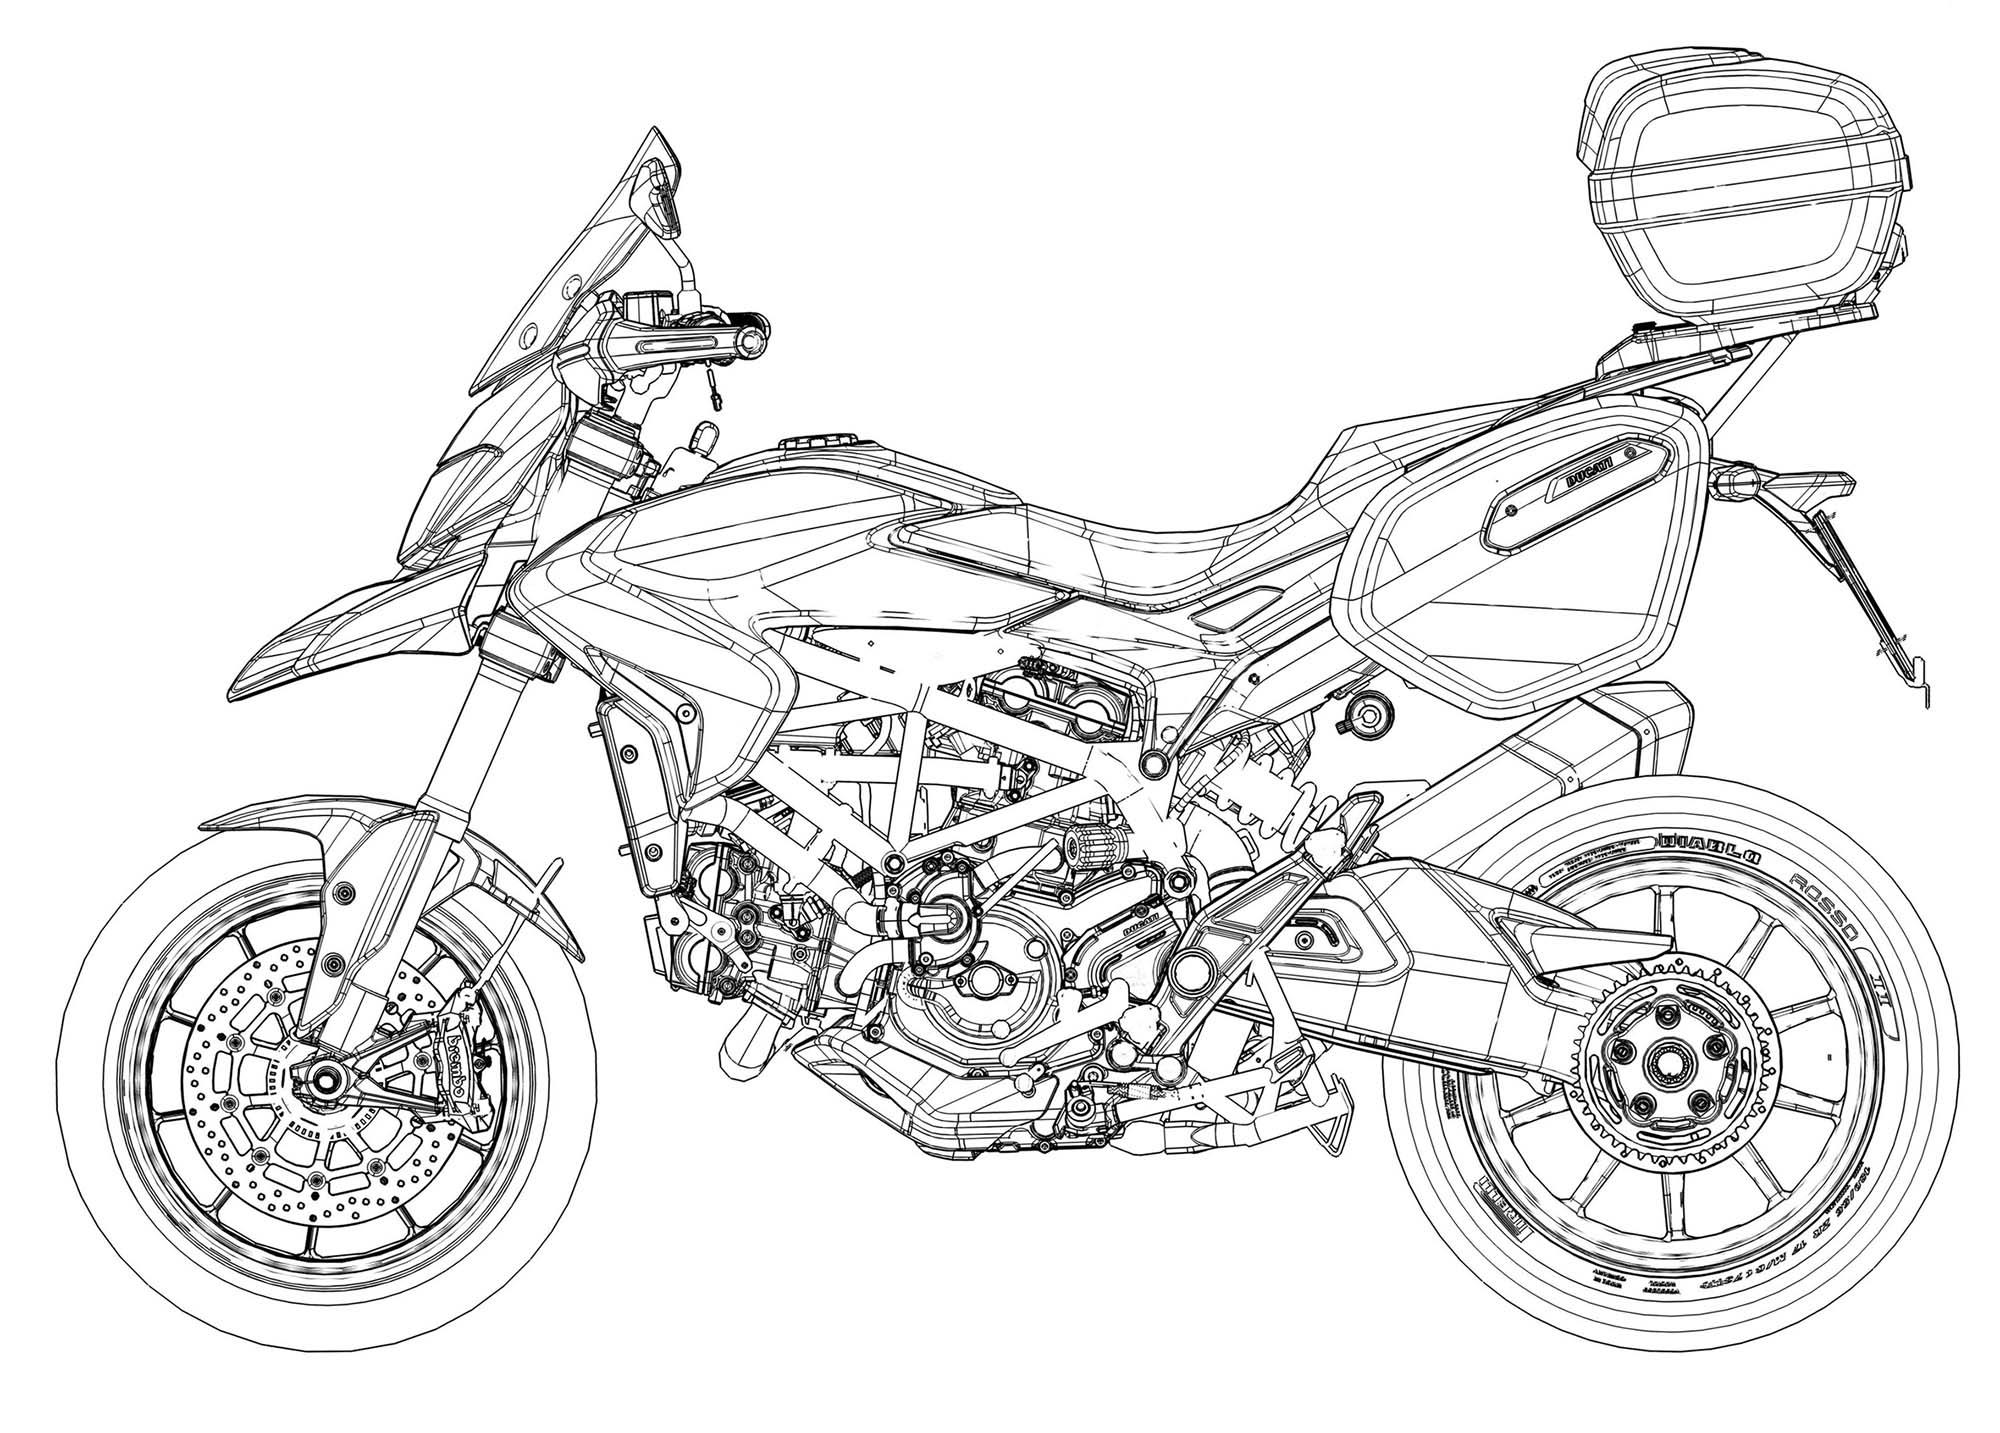 122 Photos Of The Ducati Hyperstrada